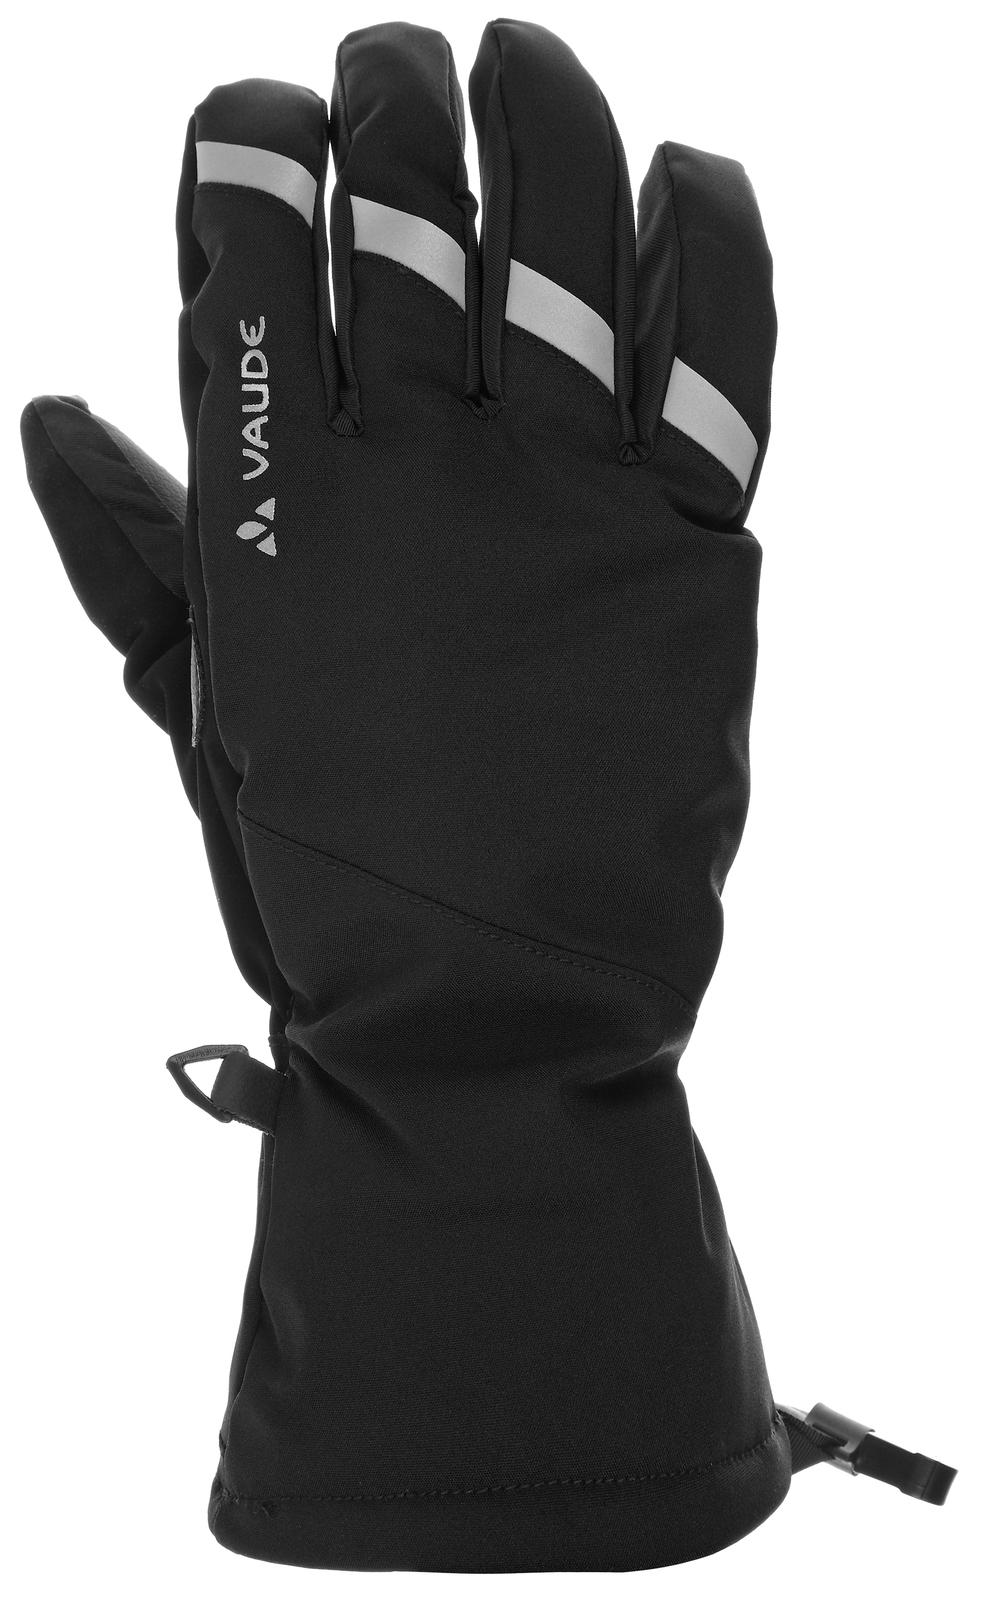 VAUDE Tura Gloves II black Größe 8 - VAUDE Tura Gloves II black Größe 8